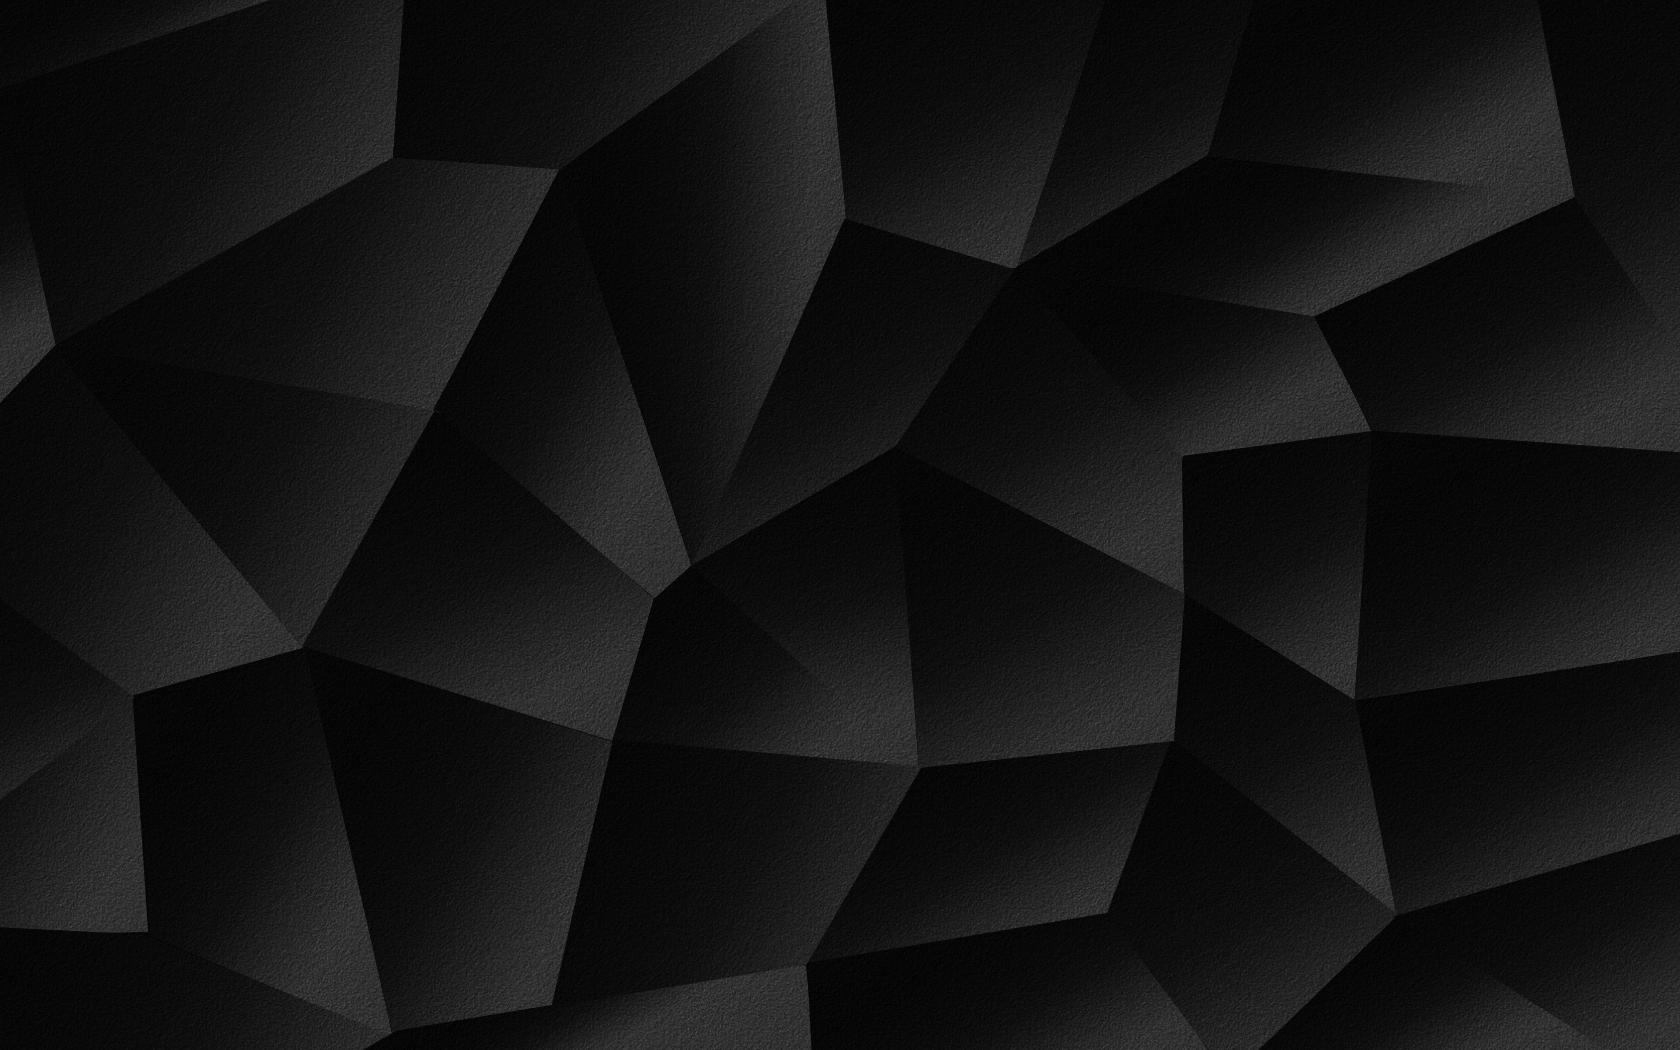 Modern Black Wallpapers   Top Modern Black Backgrounds 1680x1050